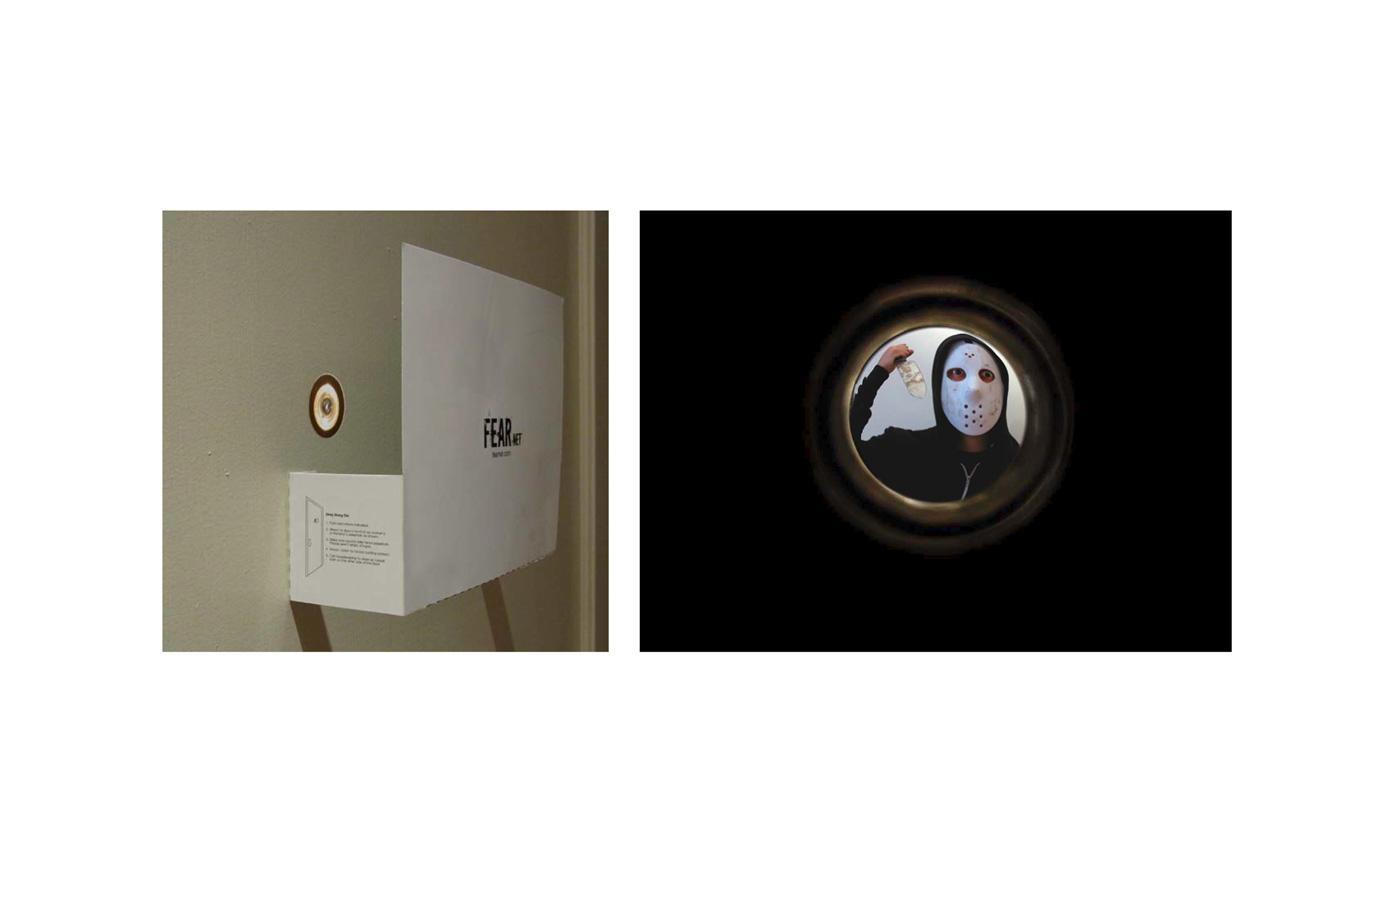 FearNet Ambient Ad -  Peephole